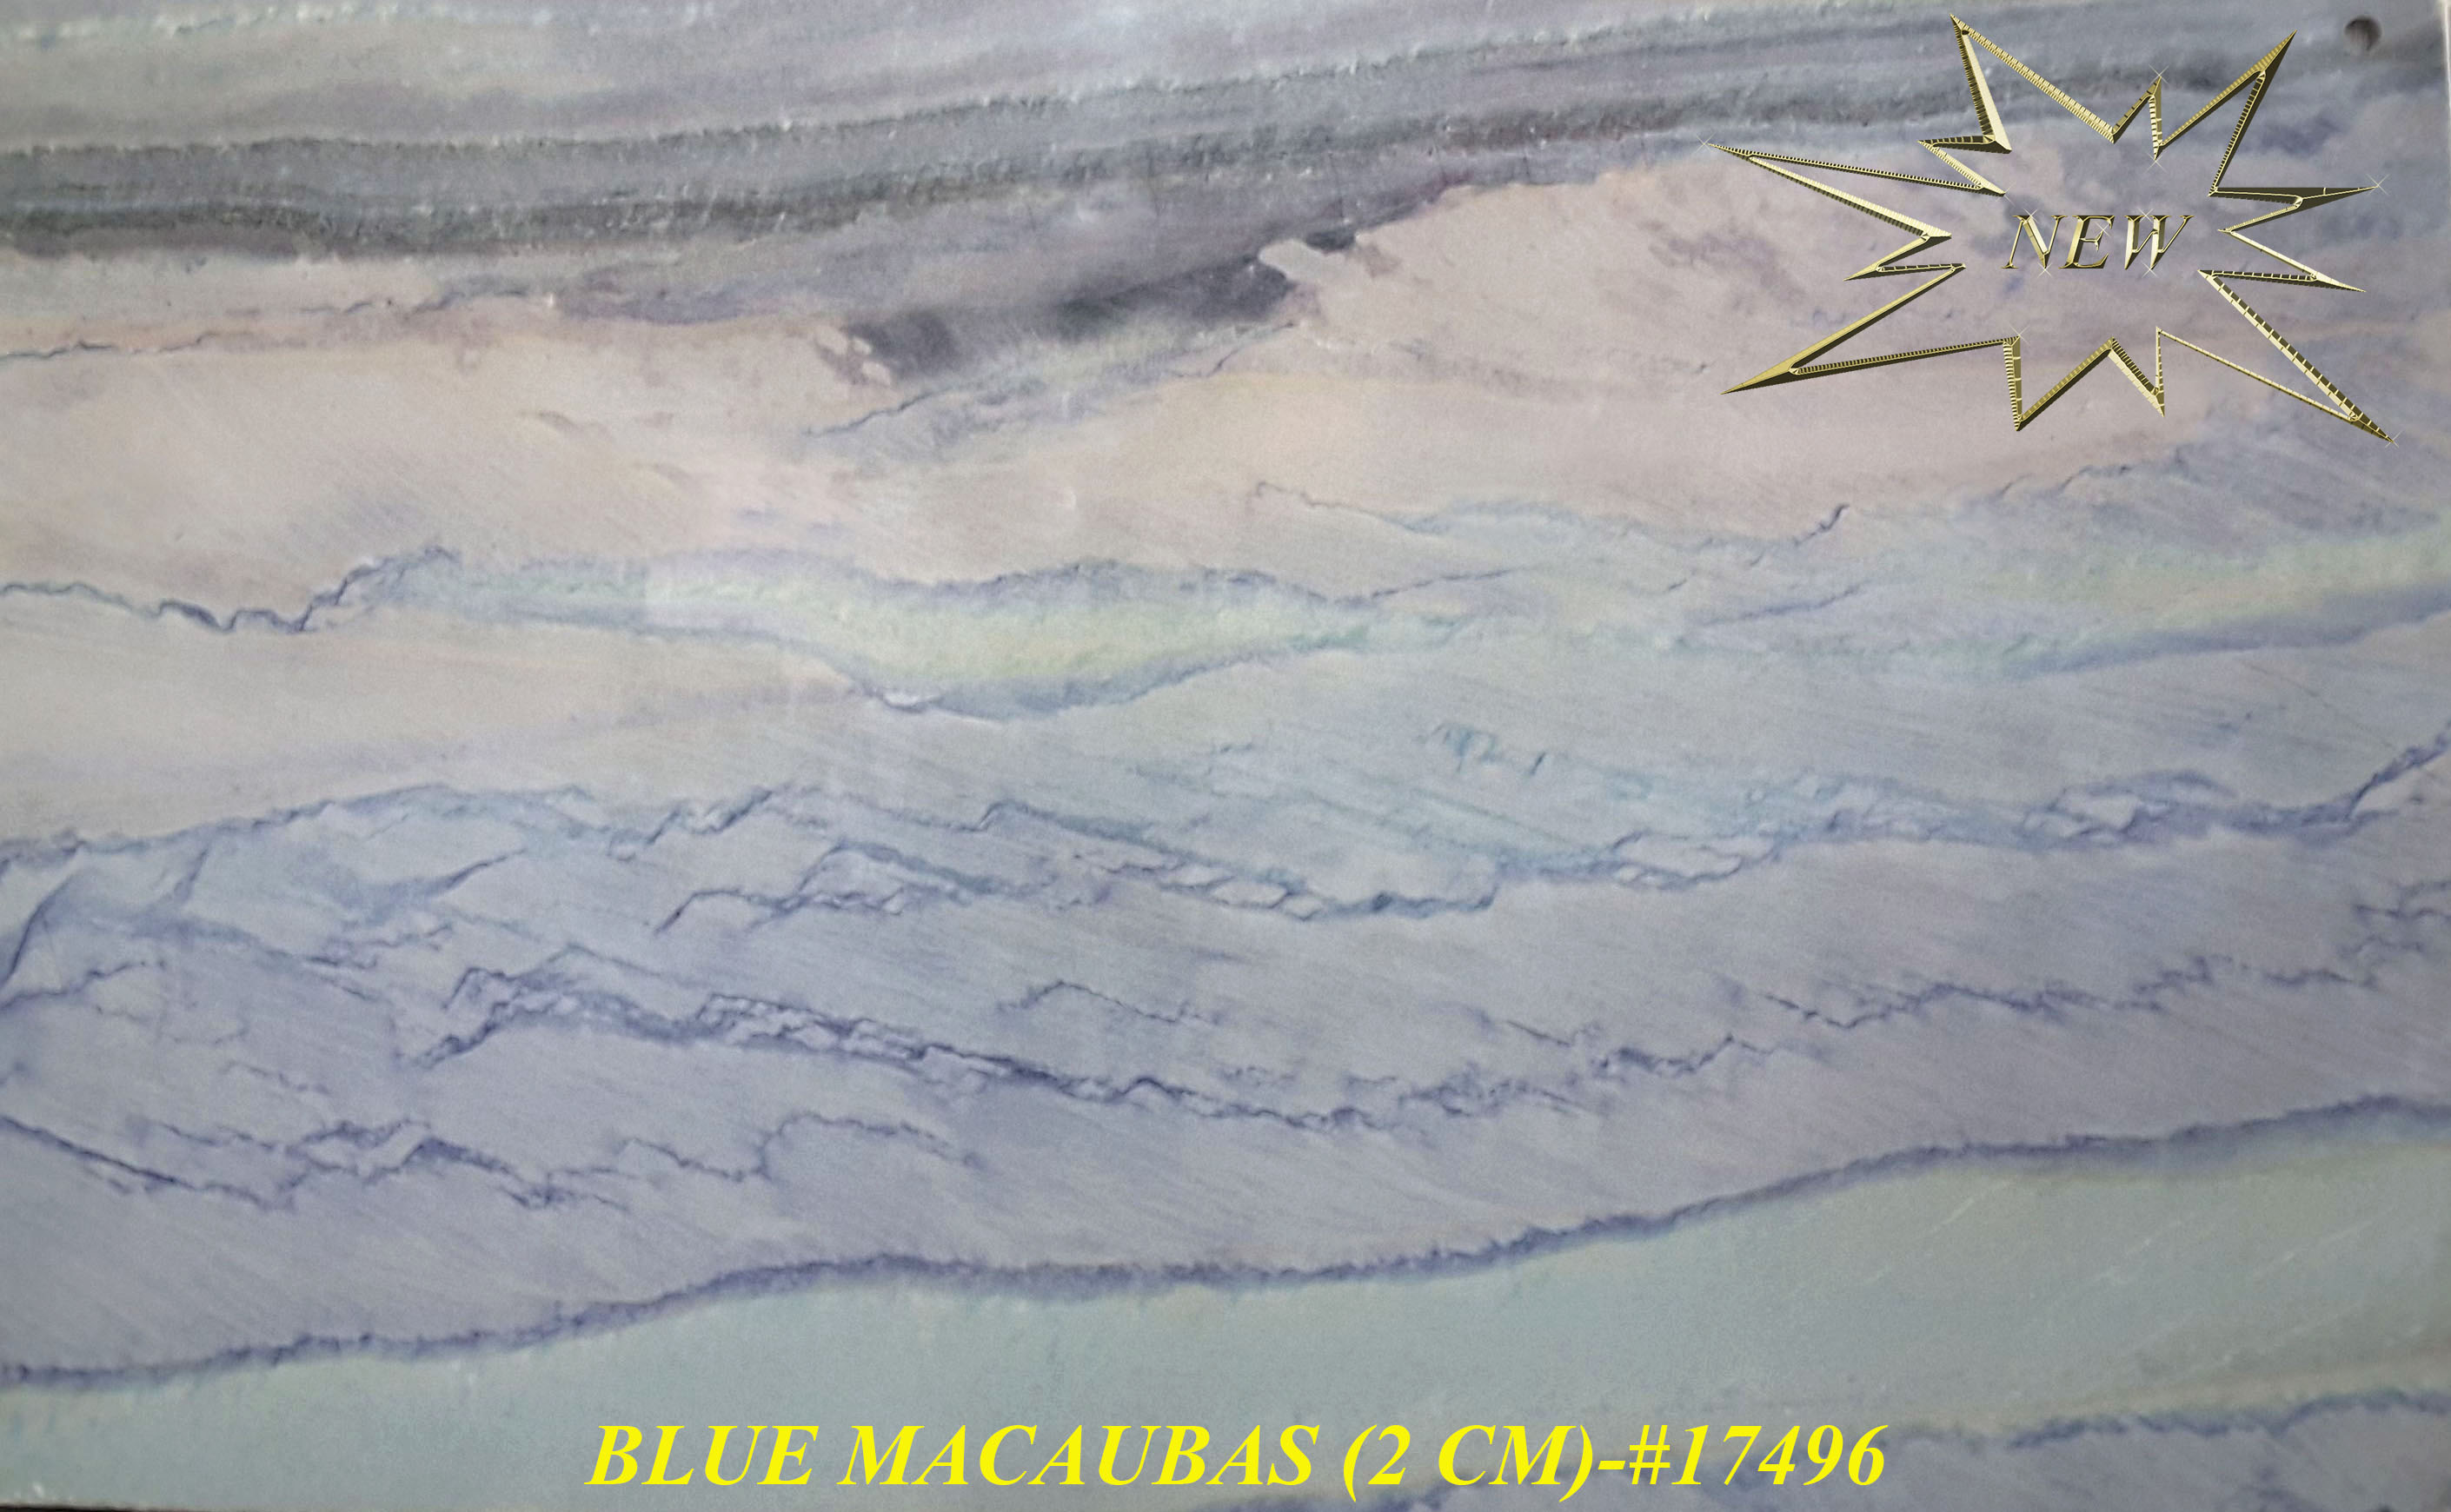 BLUE MACAUBAS (2 CM)-#17496-S